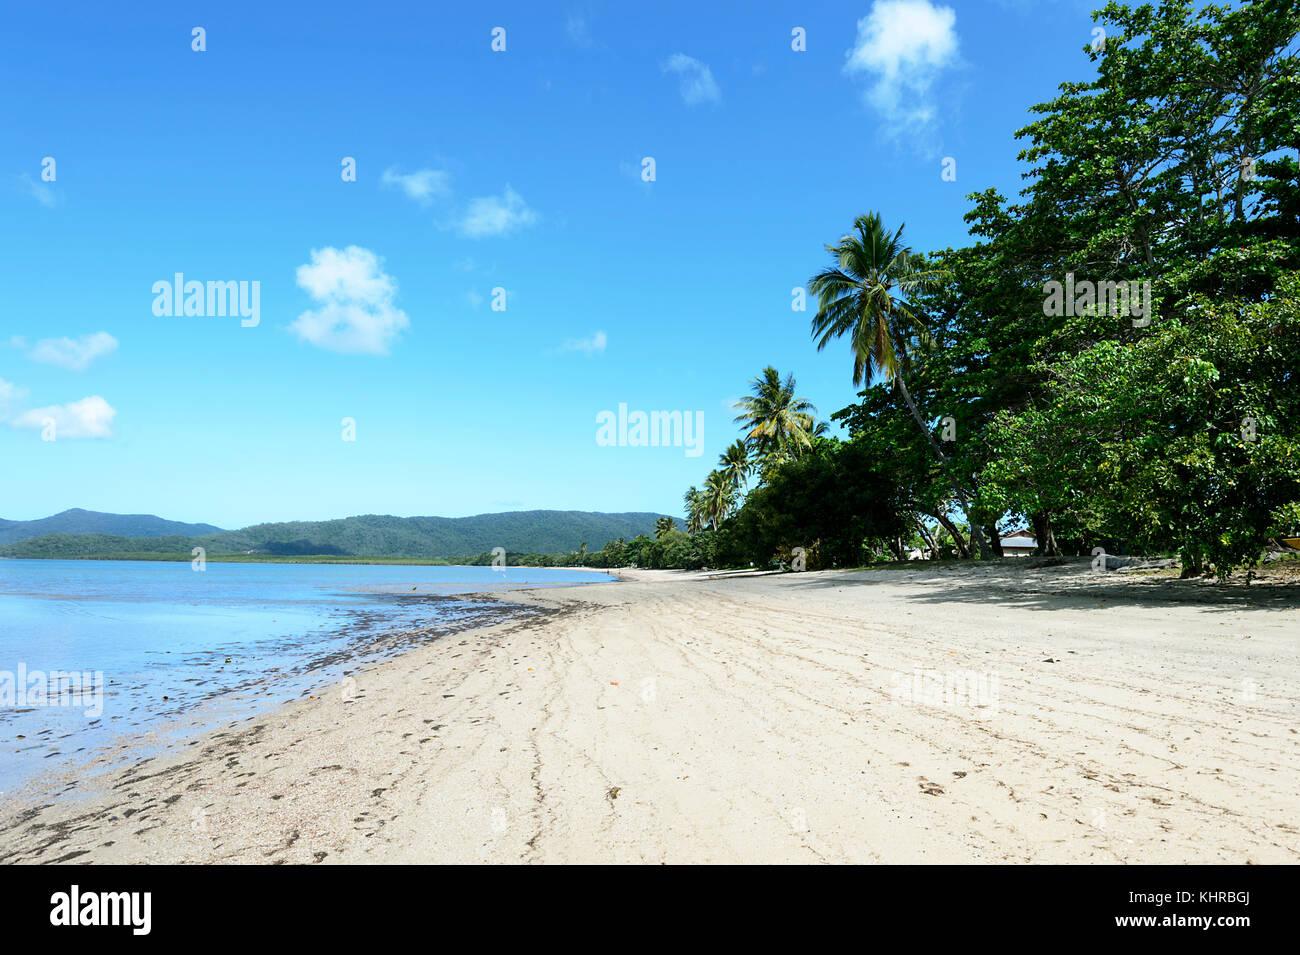 Spiaggia di sabbia della comunità Aborigena di Yarrabah, vicino a Cairns, estremo Nord Queensland, FNQ, QLD, Immagini Stock